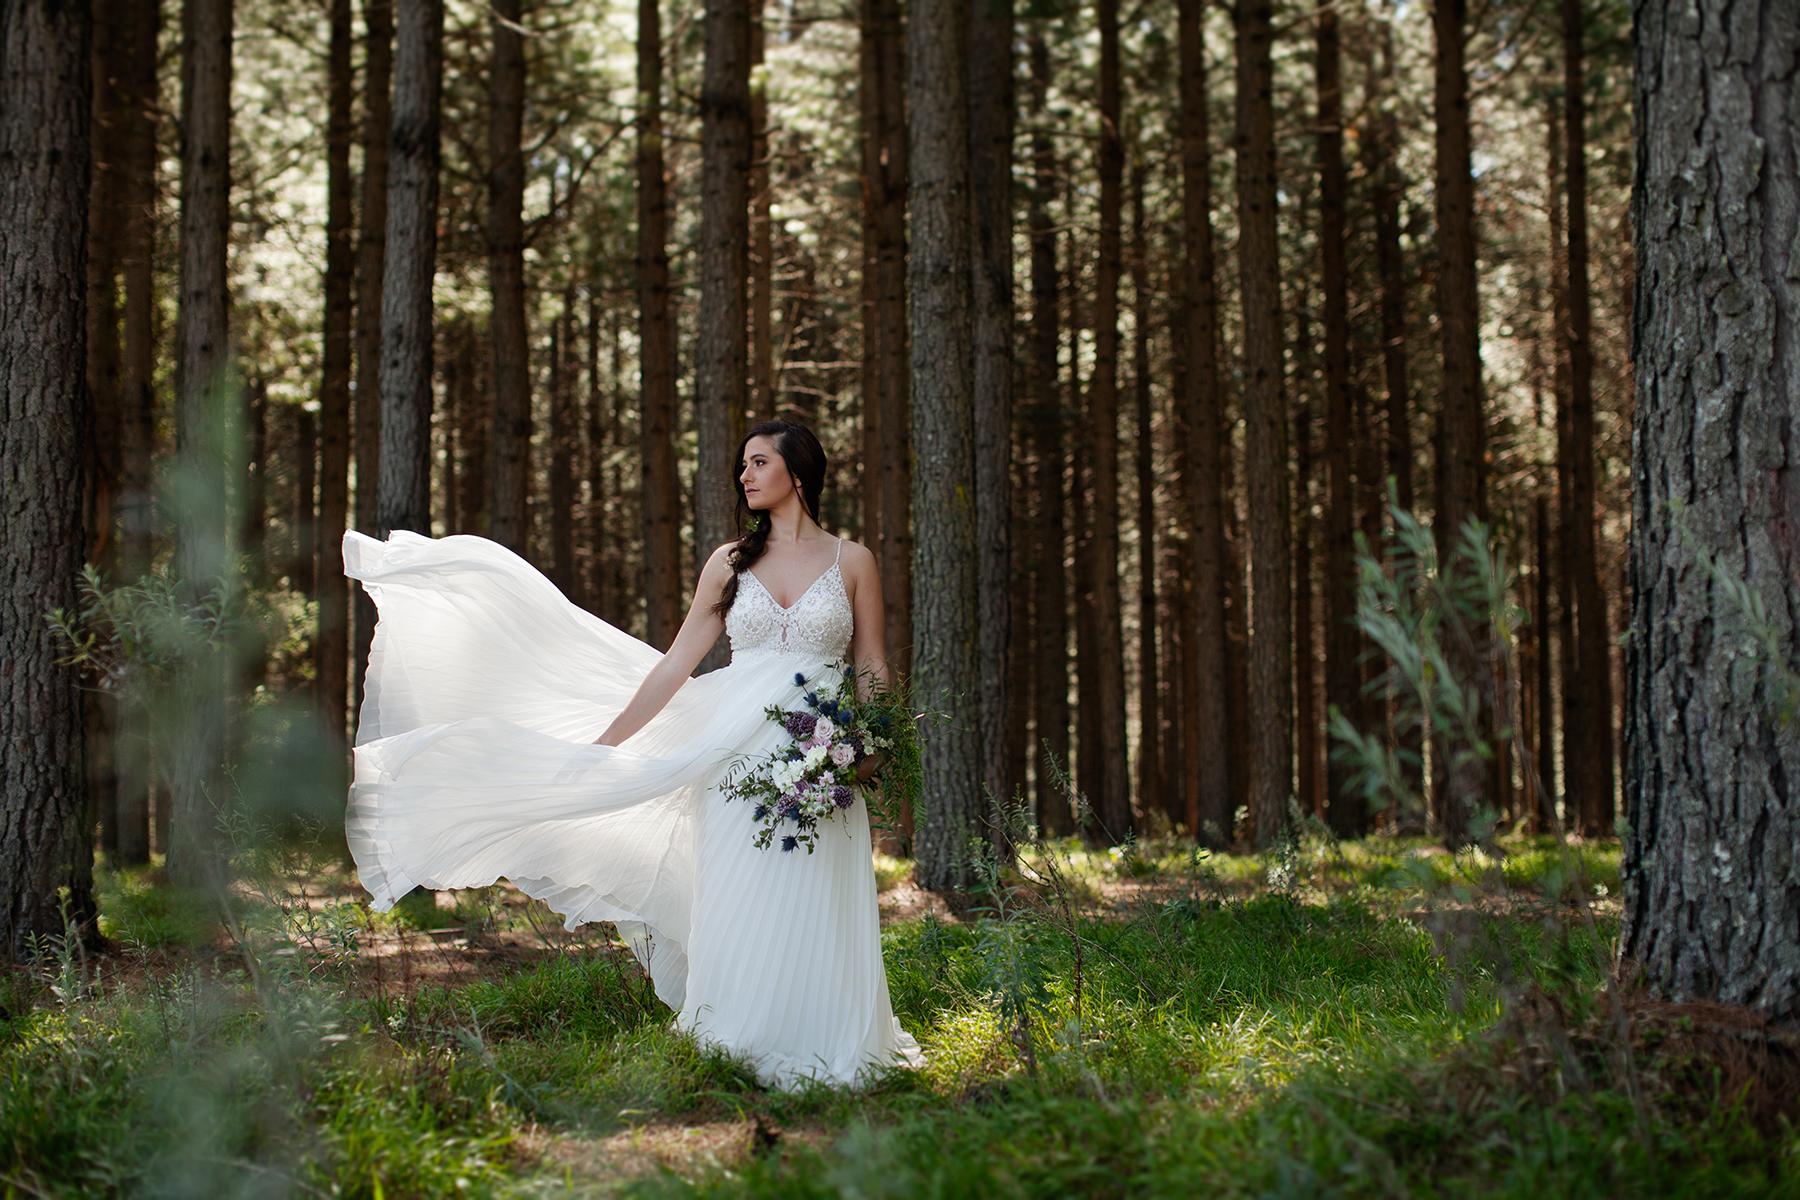 Bridal11Nov2018_HMP_02_Web.jpg